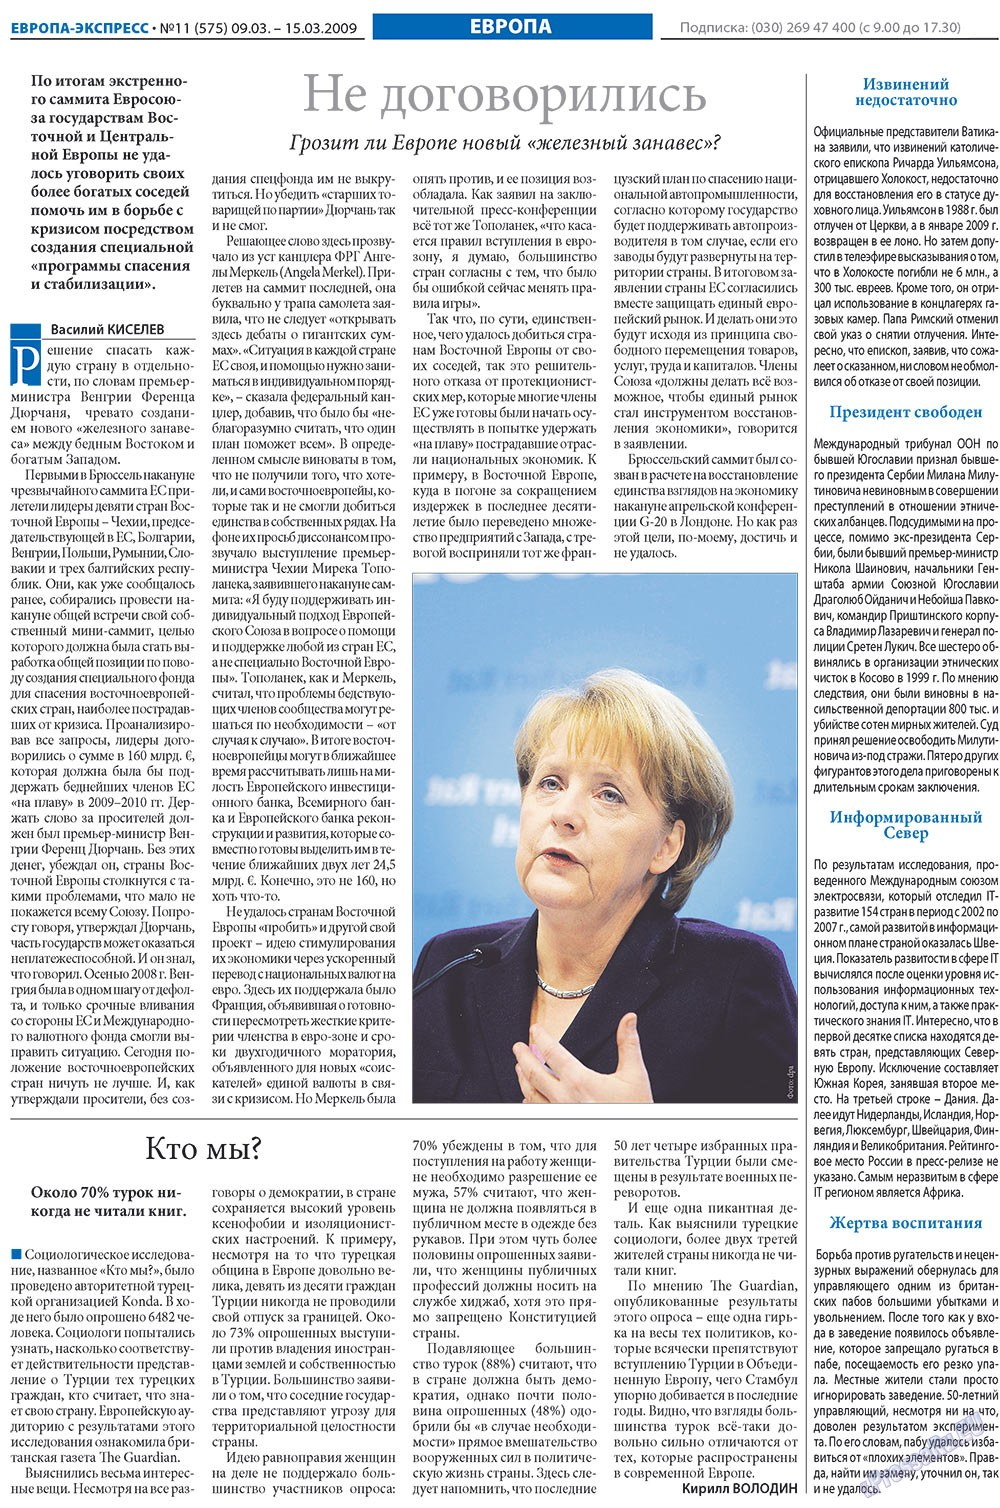 Европа экспресс (газета). 2009 год, номер 11, стр. 10